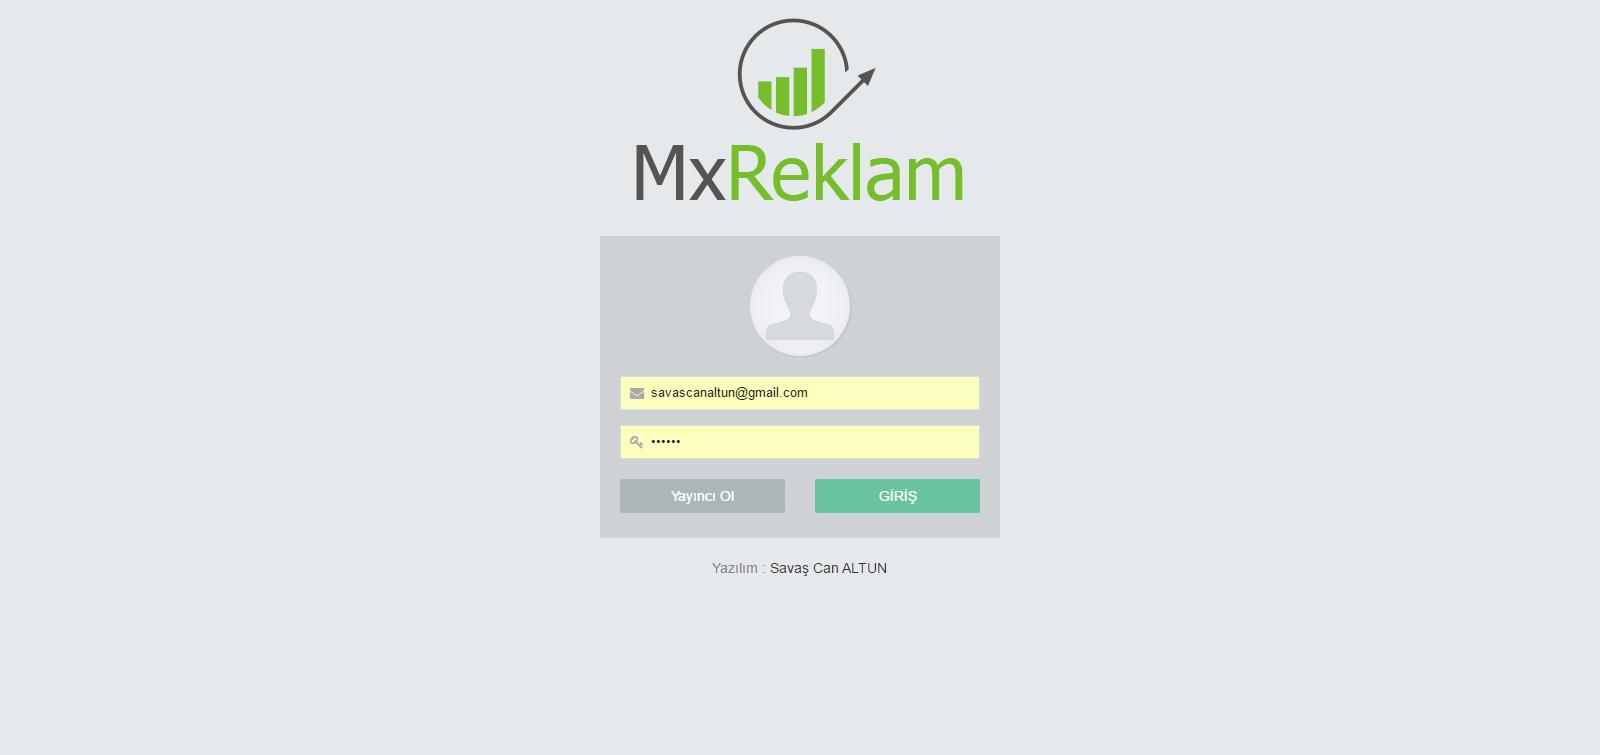 mxreklam-2